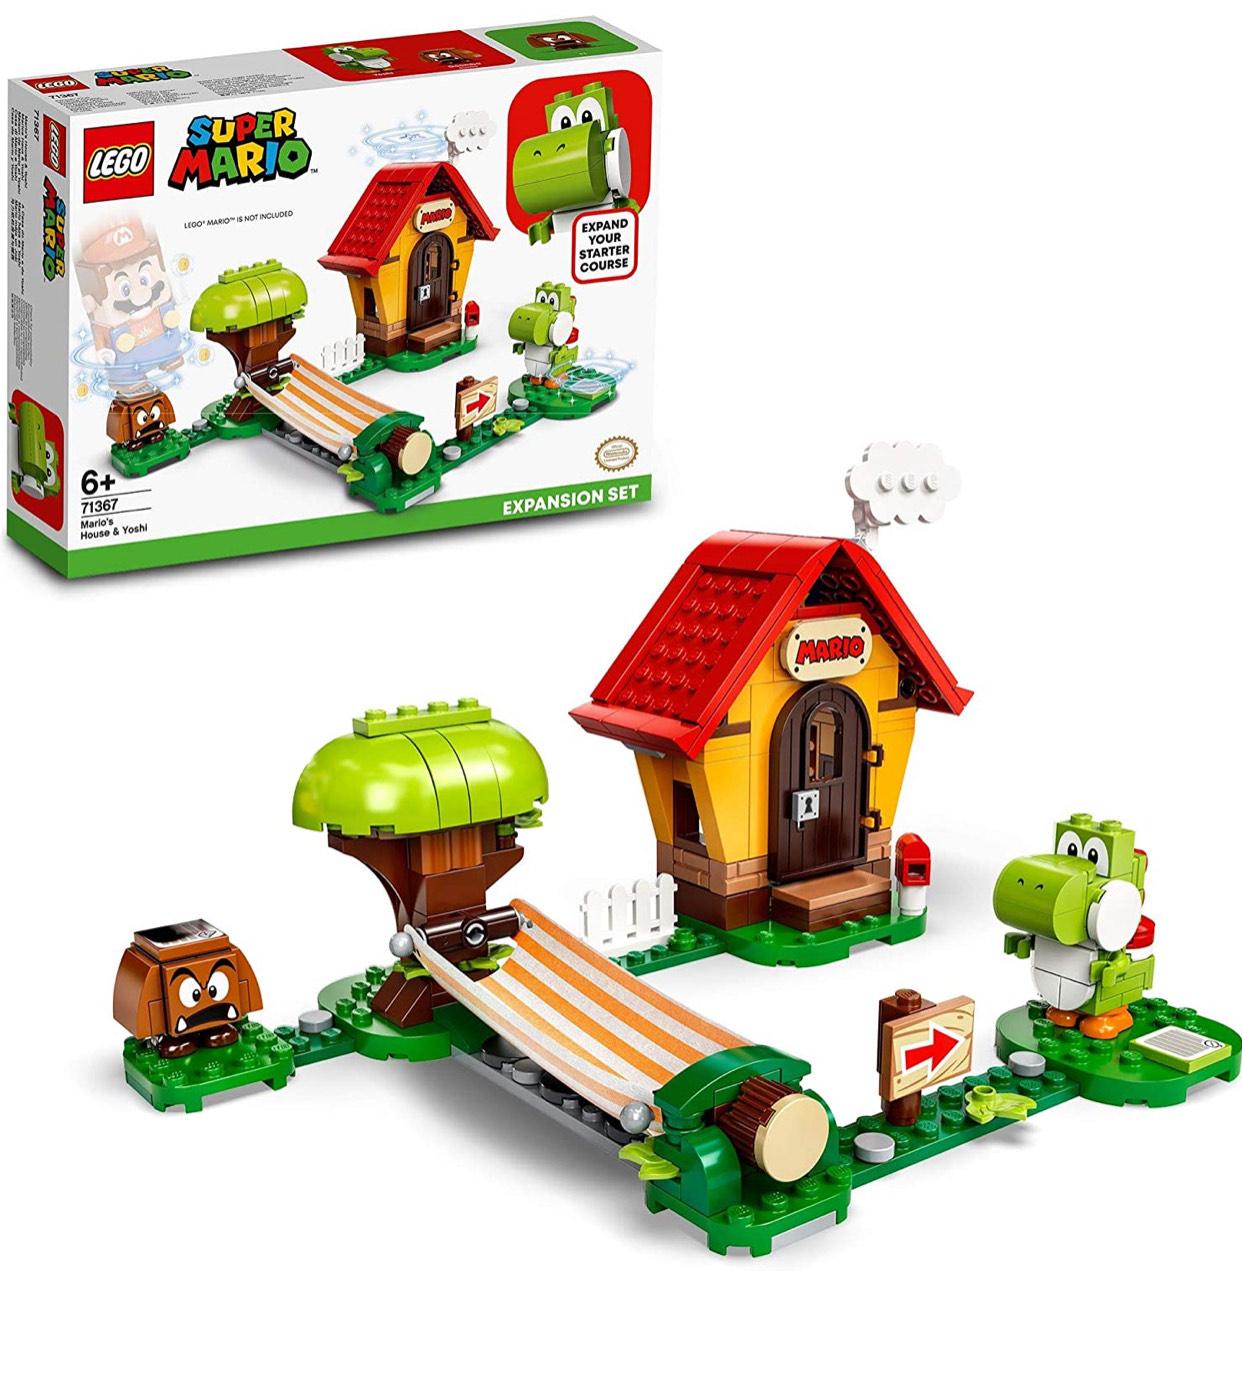 LEGO 71367 Super Mario House & Yoshi Expansion Set Buildable Game - £17.99 Prime / +£4.49 non Prime at Amazon